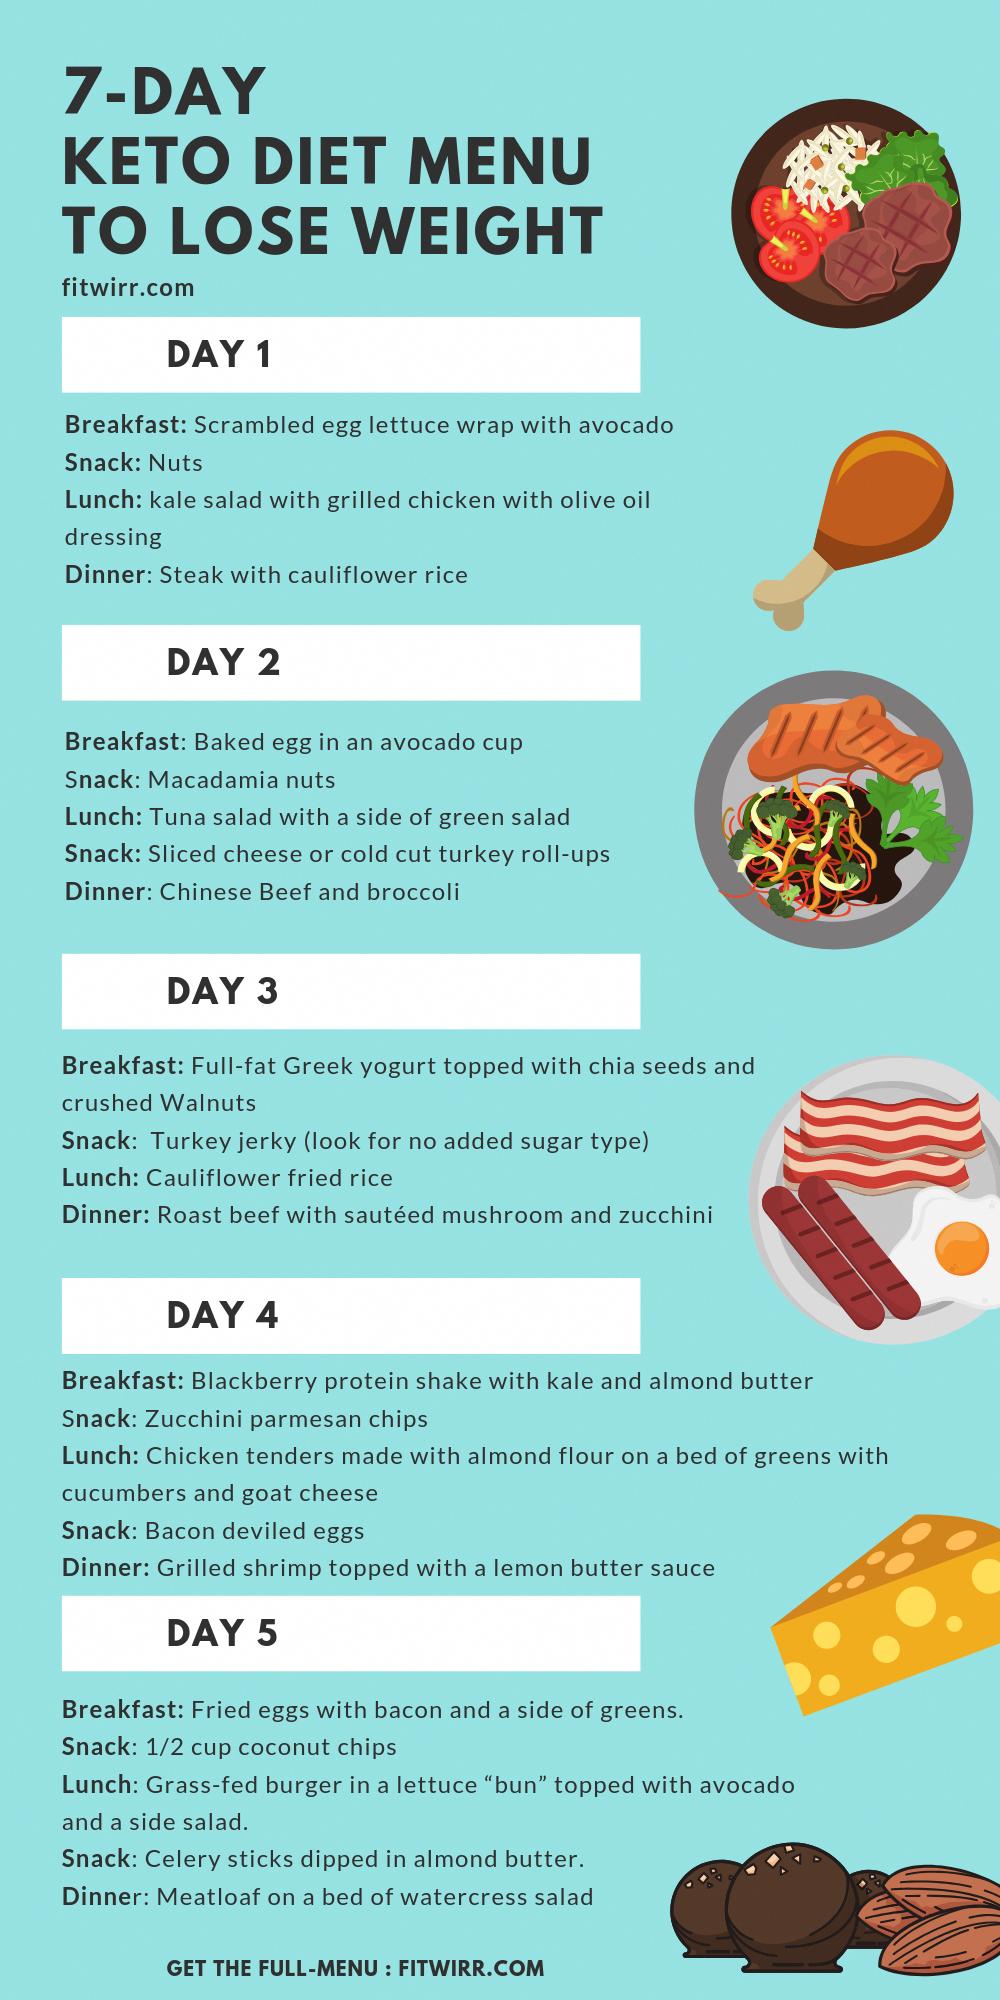 Keto Diet Menu 7Day Keto Meal Plan for Beginners